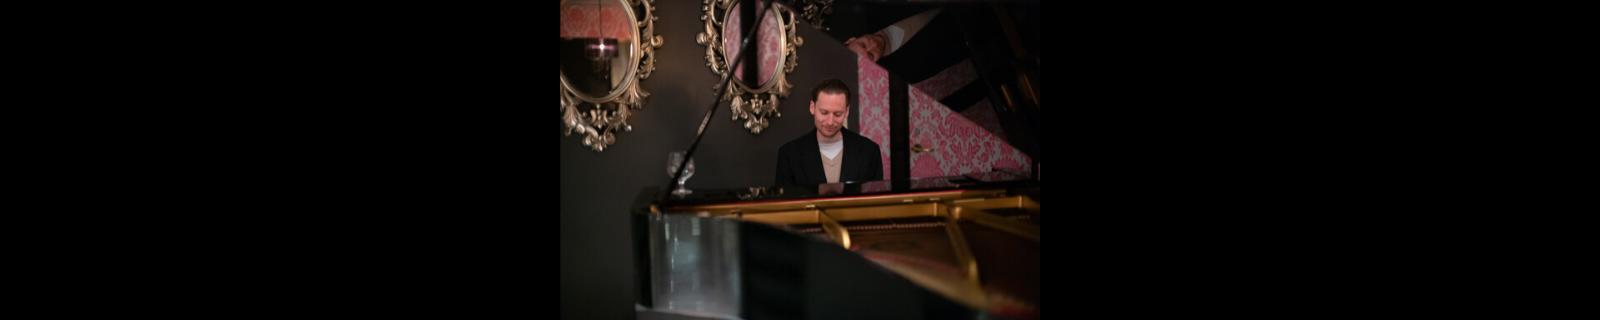 Grant Levin Pianist Kanpai Kounge Hotel Nikko San Francisco